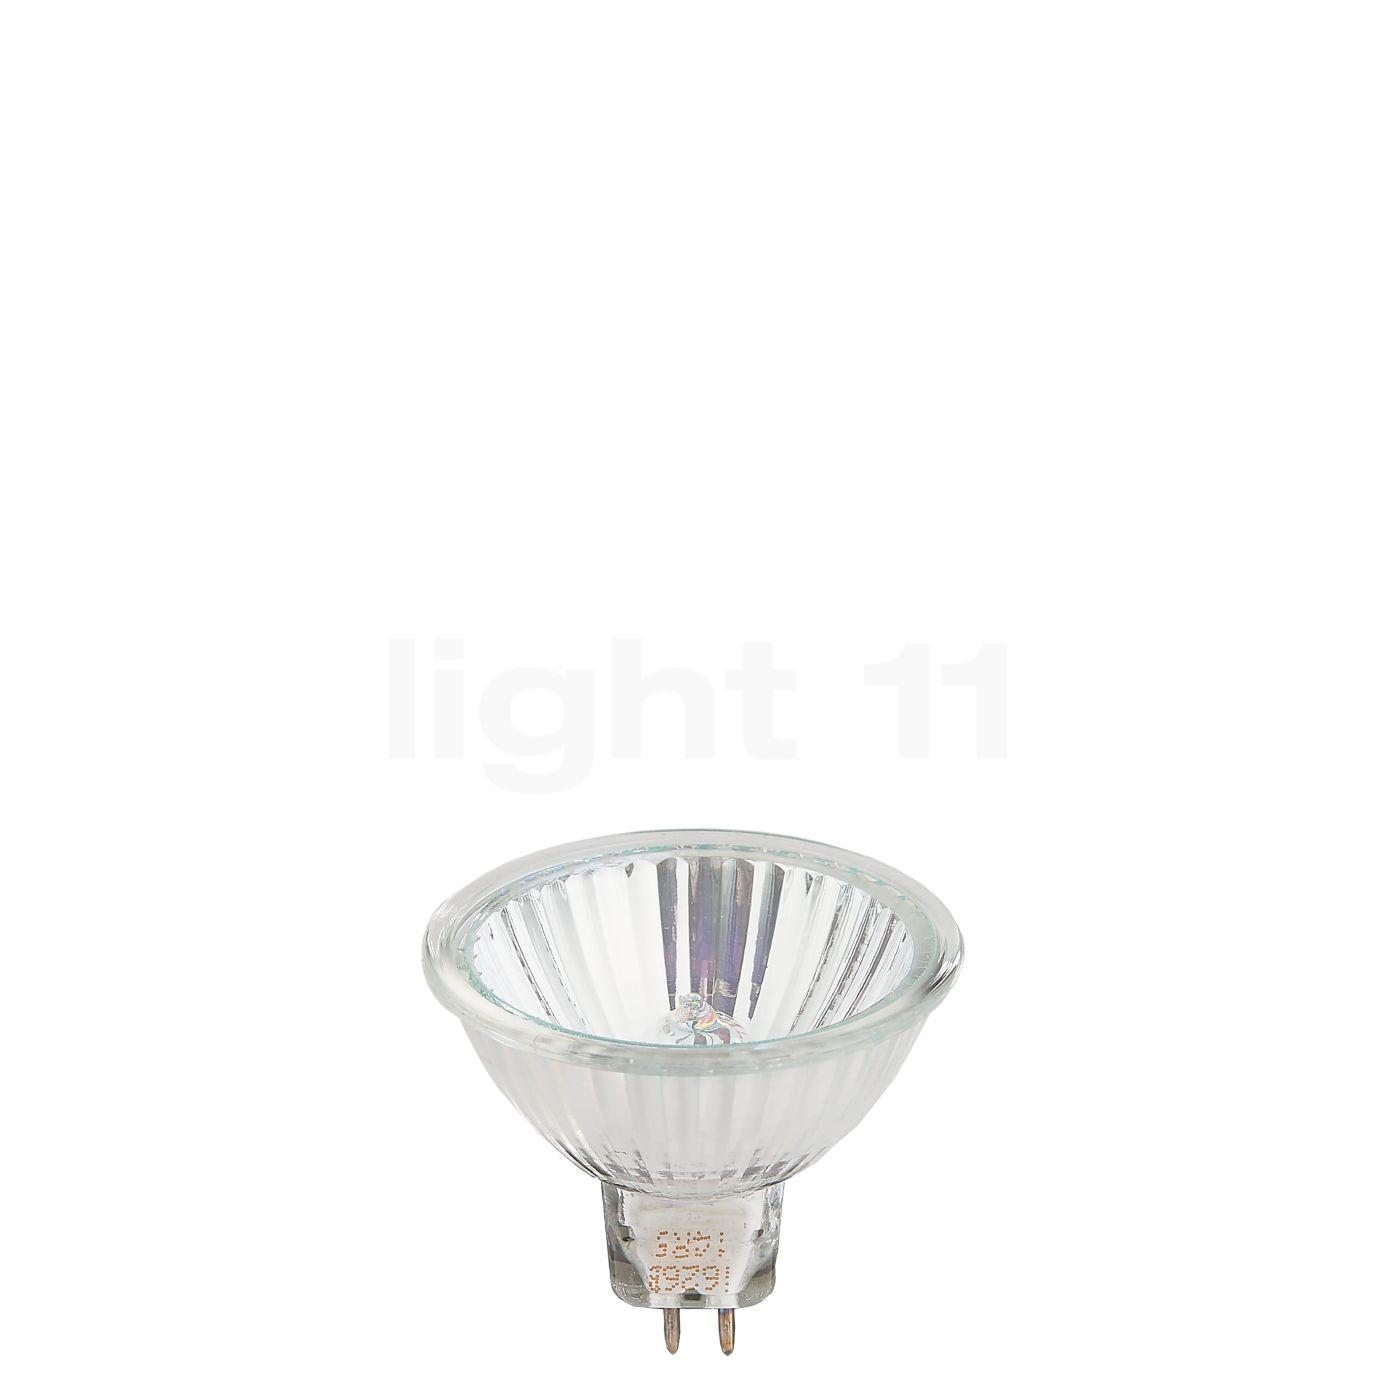 Radium qr cbc51 50w24 gu53 12v buy at light11 parisarafo Choice Image